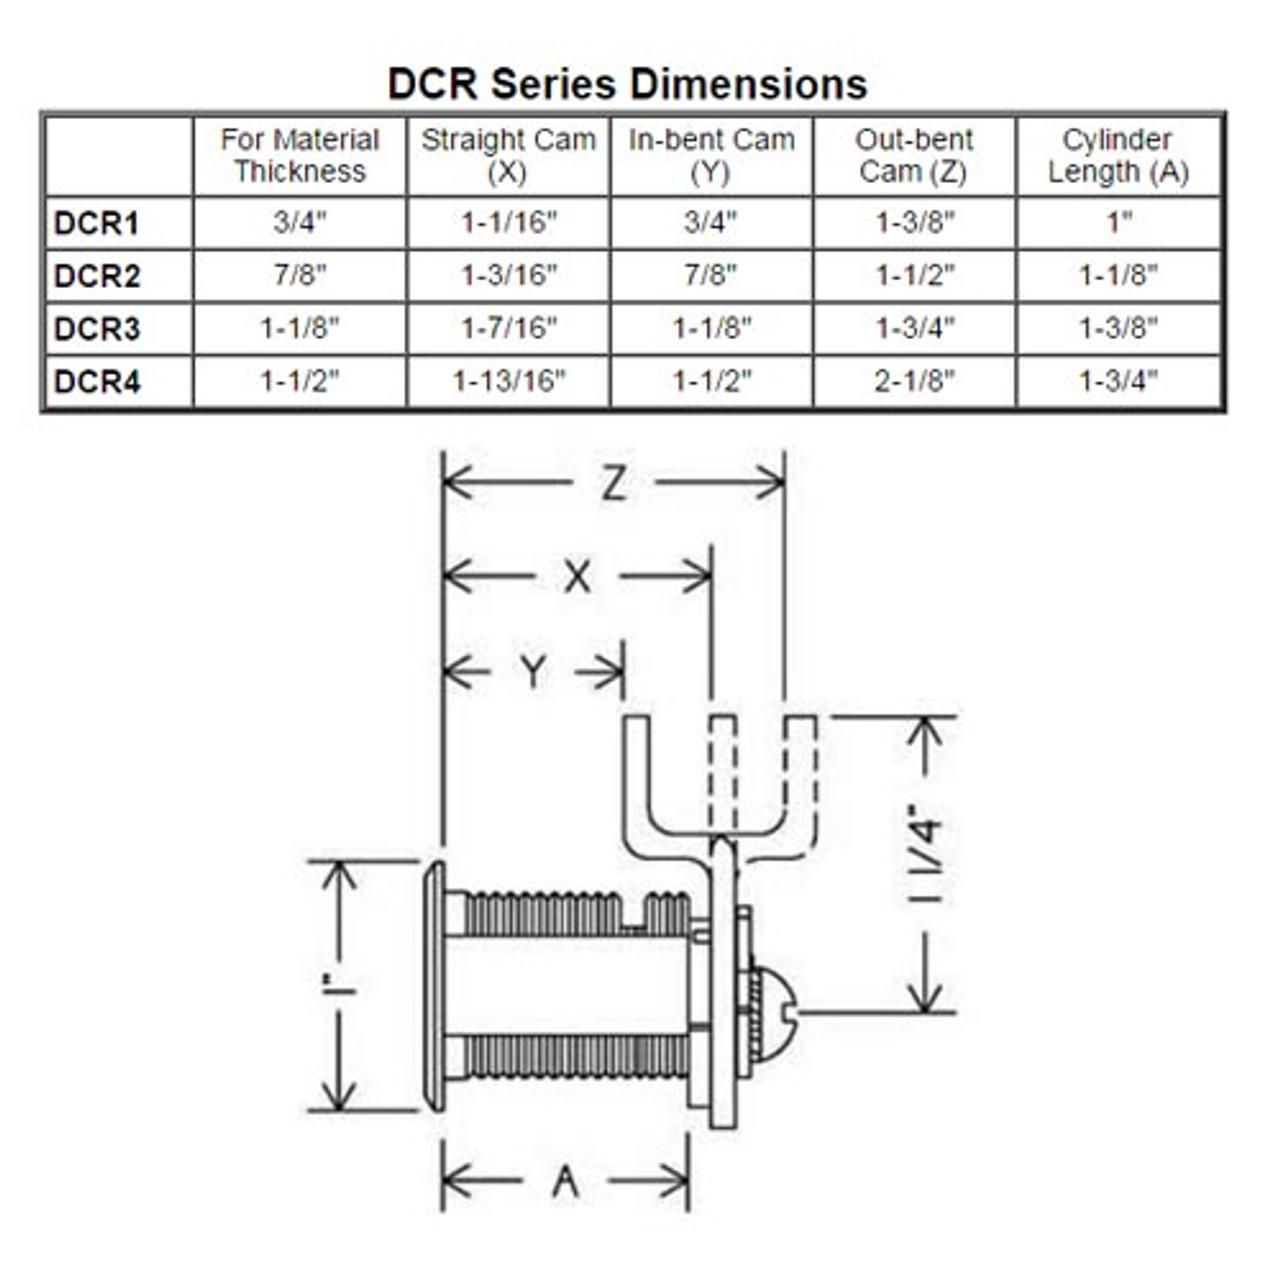 Olympus DCR1-KD-26D R Series Keyed Different Reversible Cam Lock in Satin Chrome